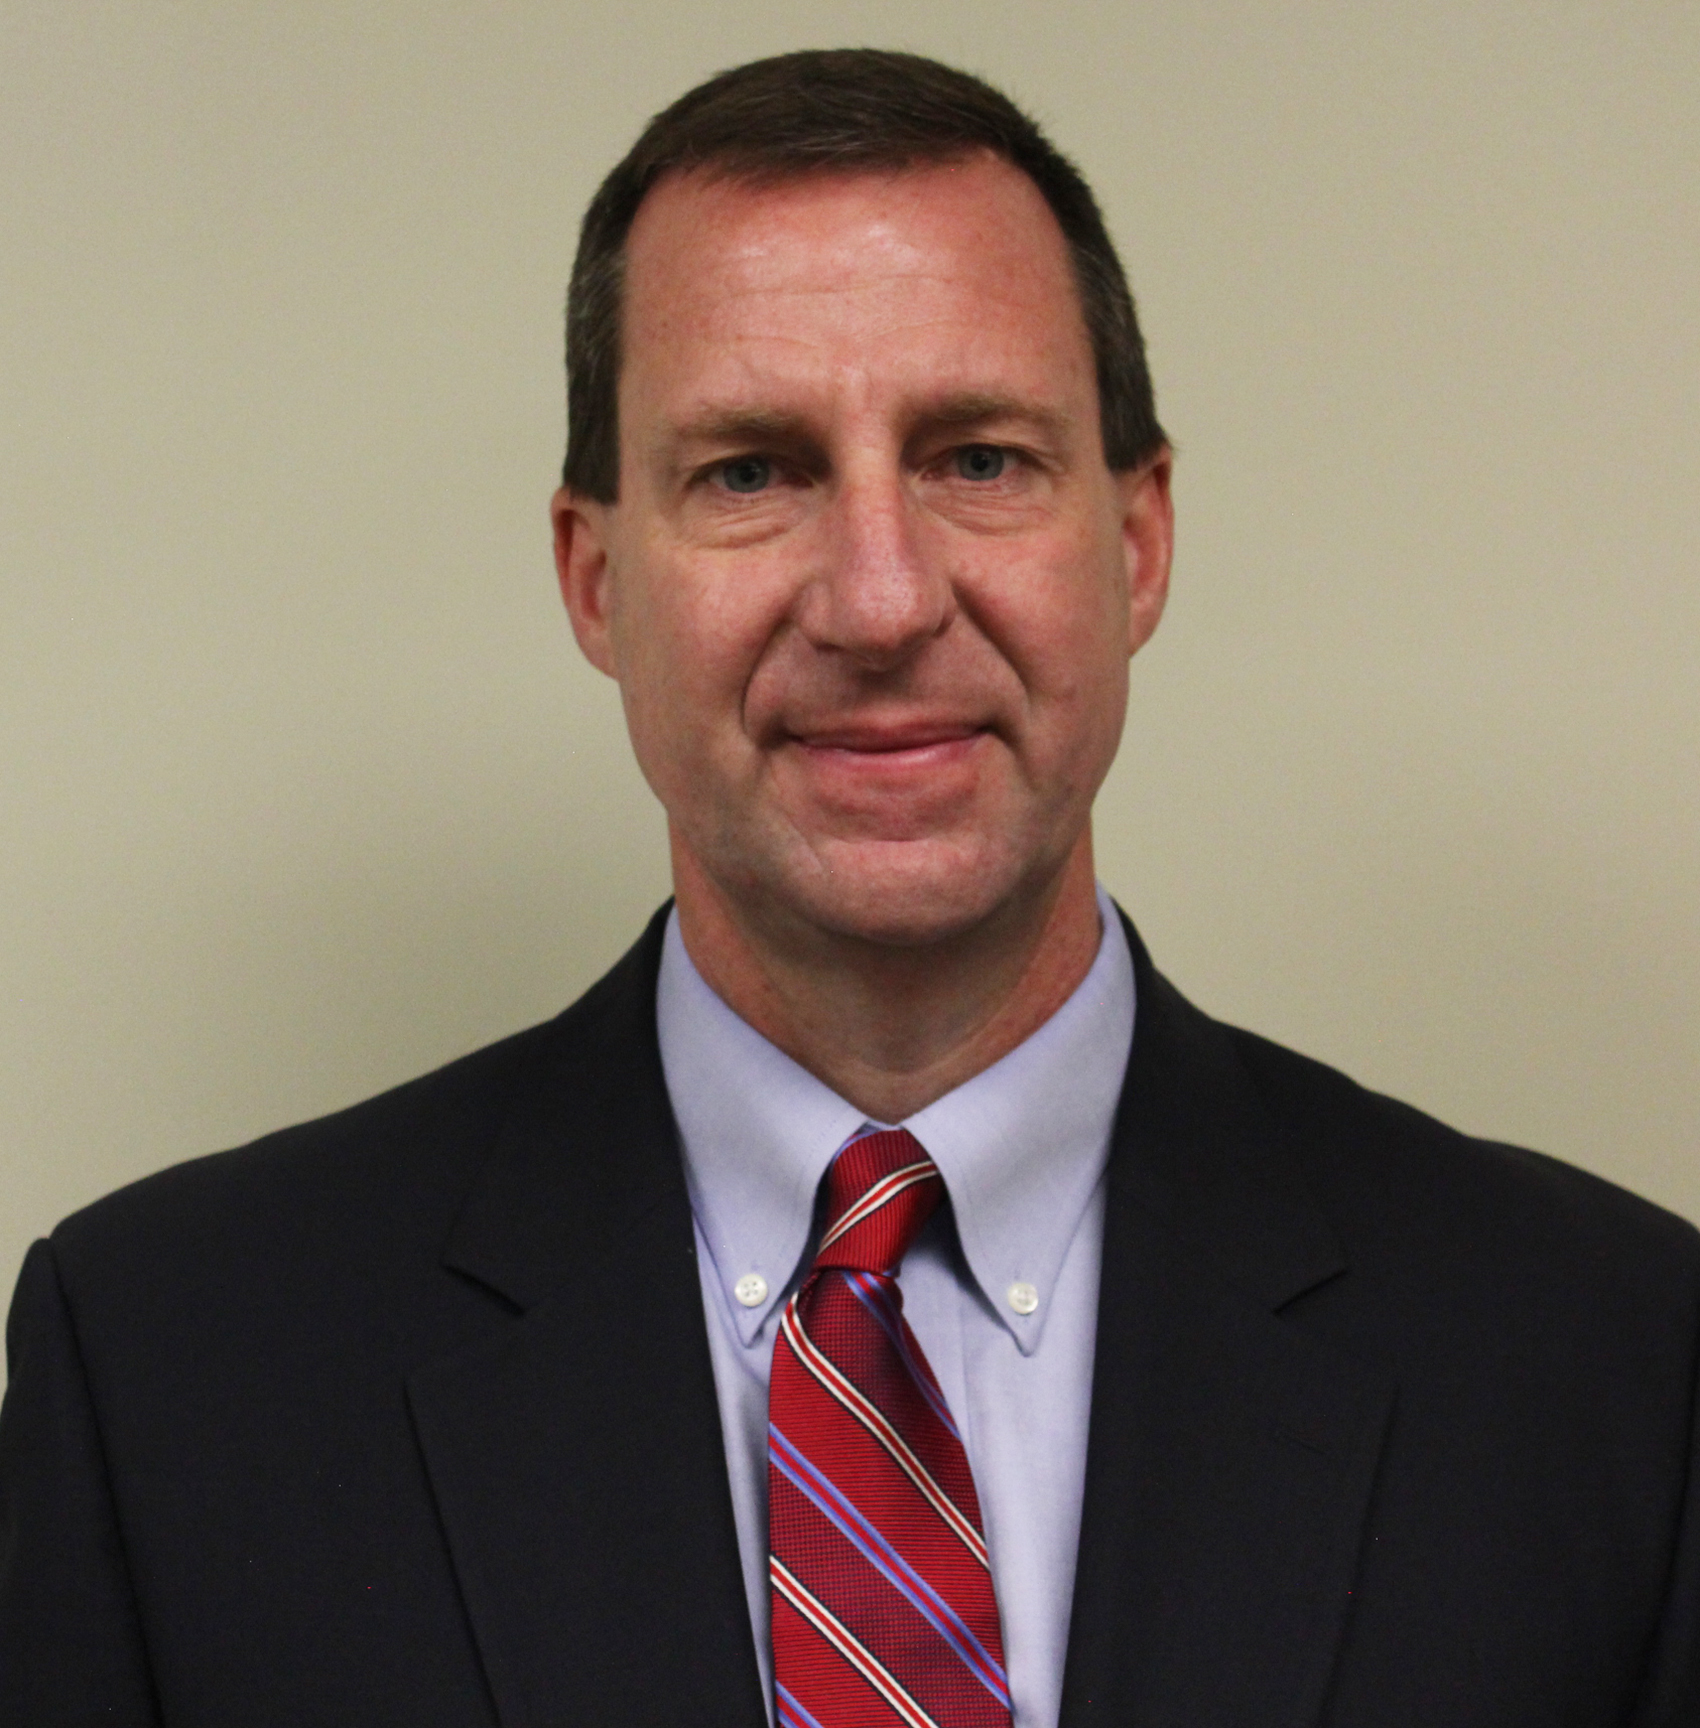 Principal Todd Rings